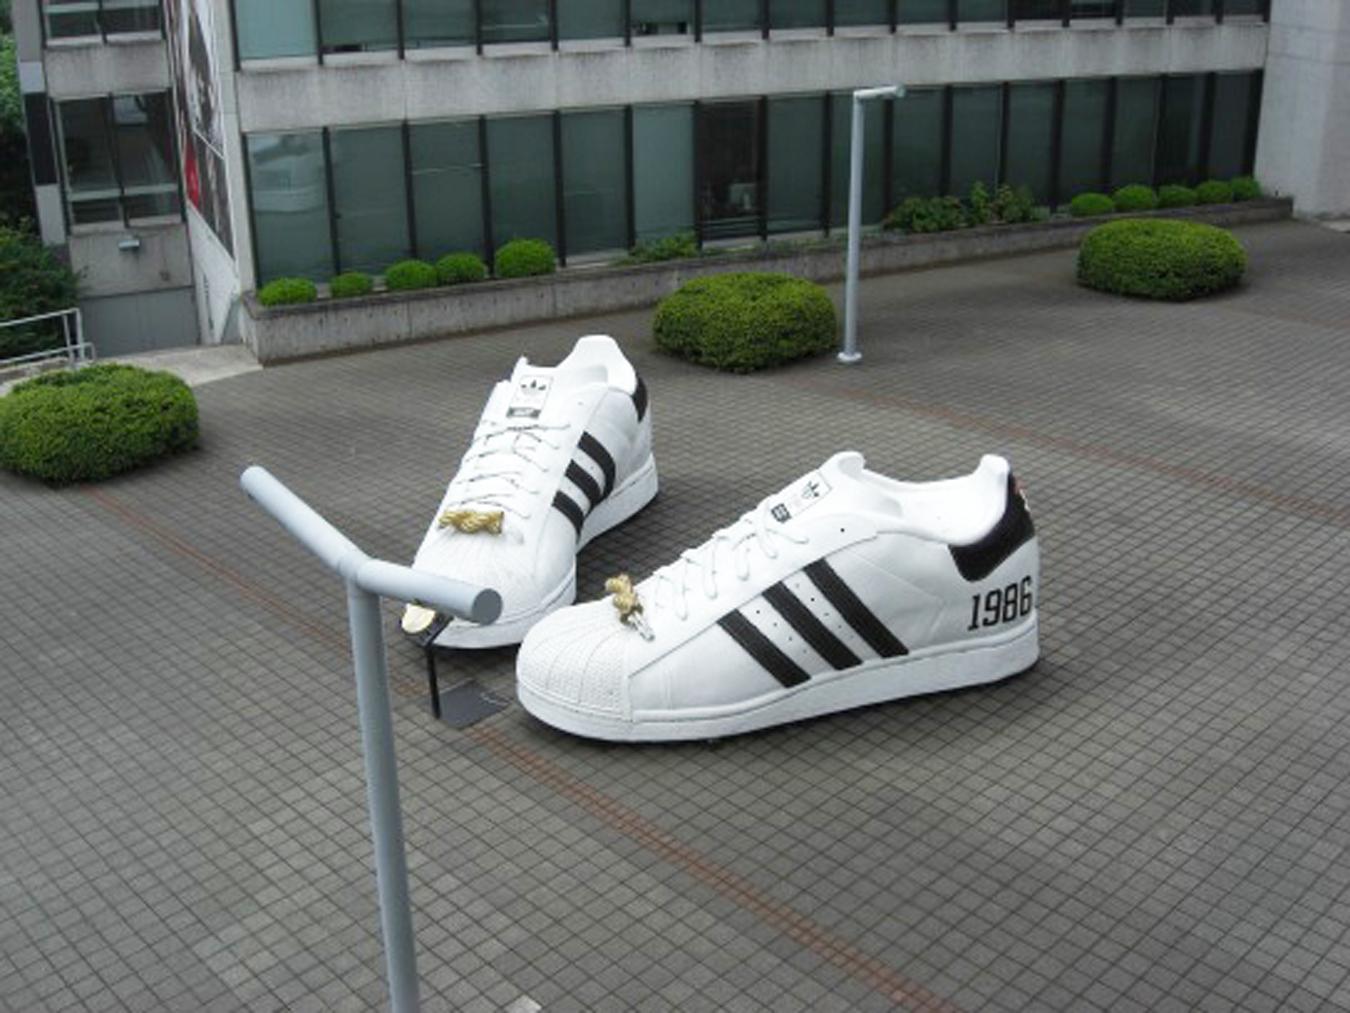 pensoleography / adidas calzature design accademia leo ochoa design